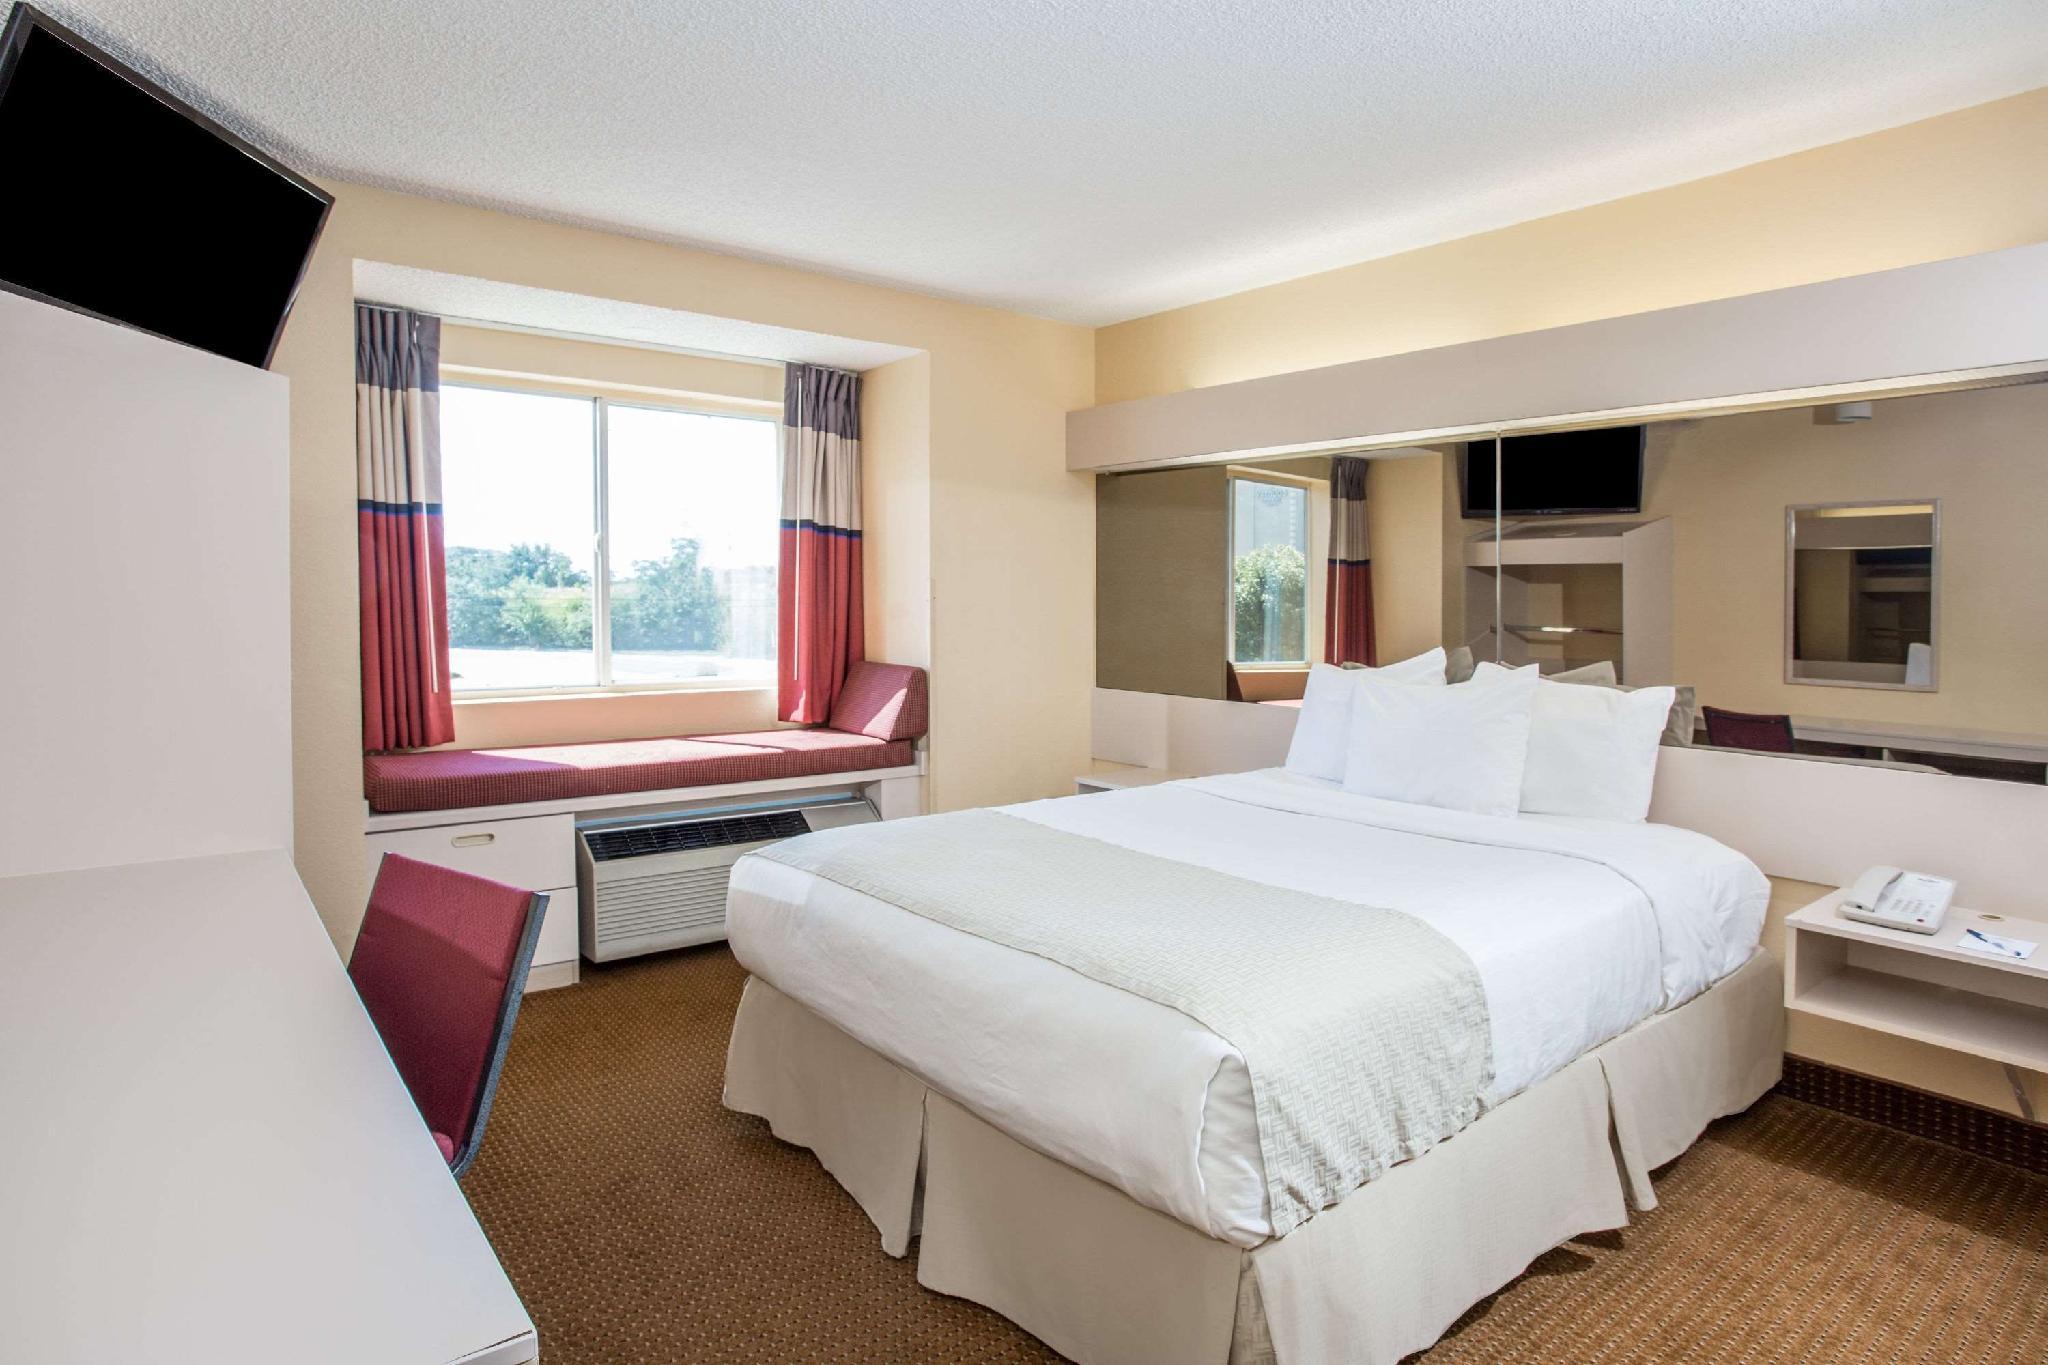 Microtel Inn & Suites by Wyndham Tifton, Tift